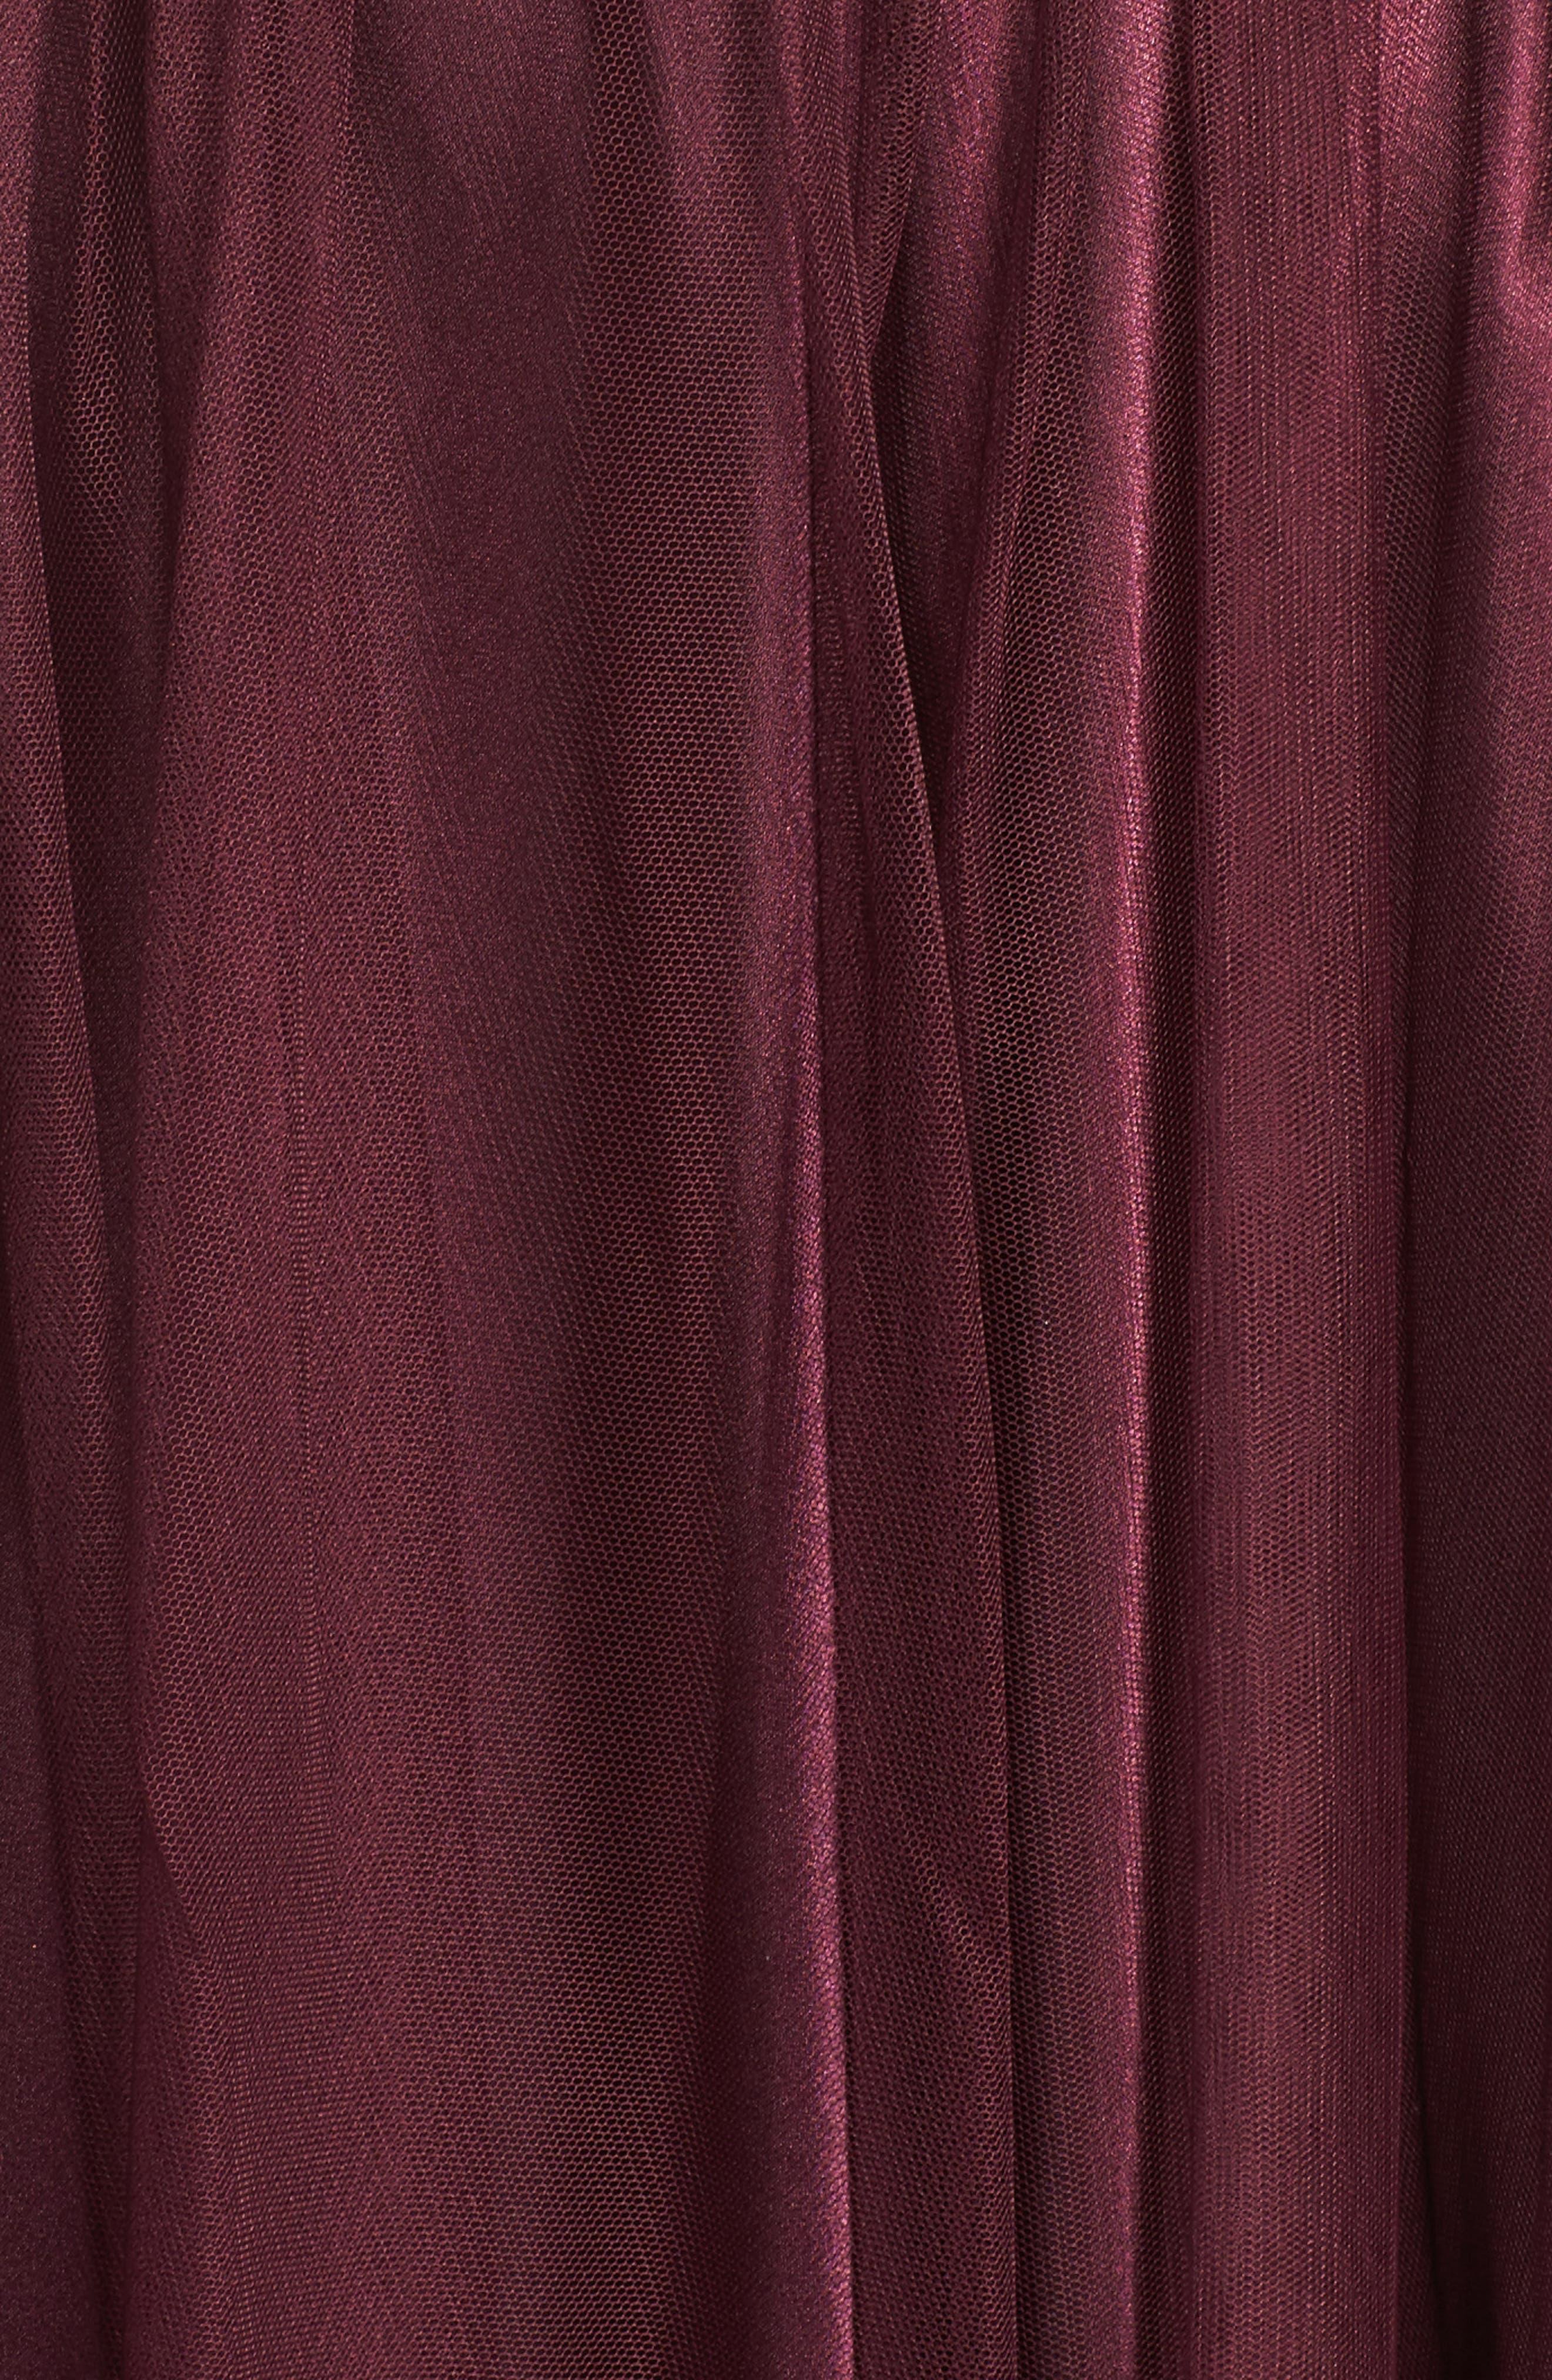 Strapless Appliqué Ballgown,                             Alternate thumbnail 6, color,                             Nude/ Wine